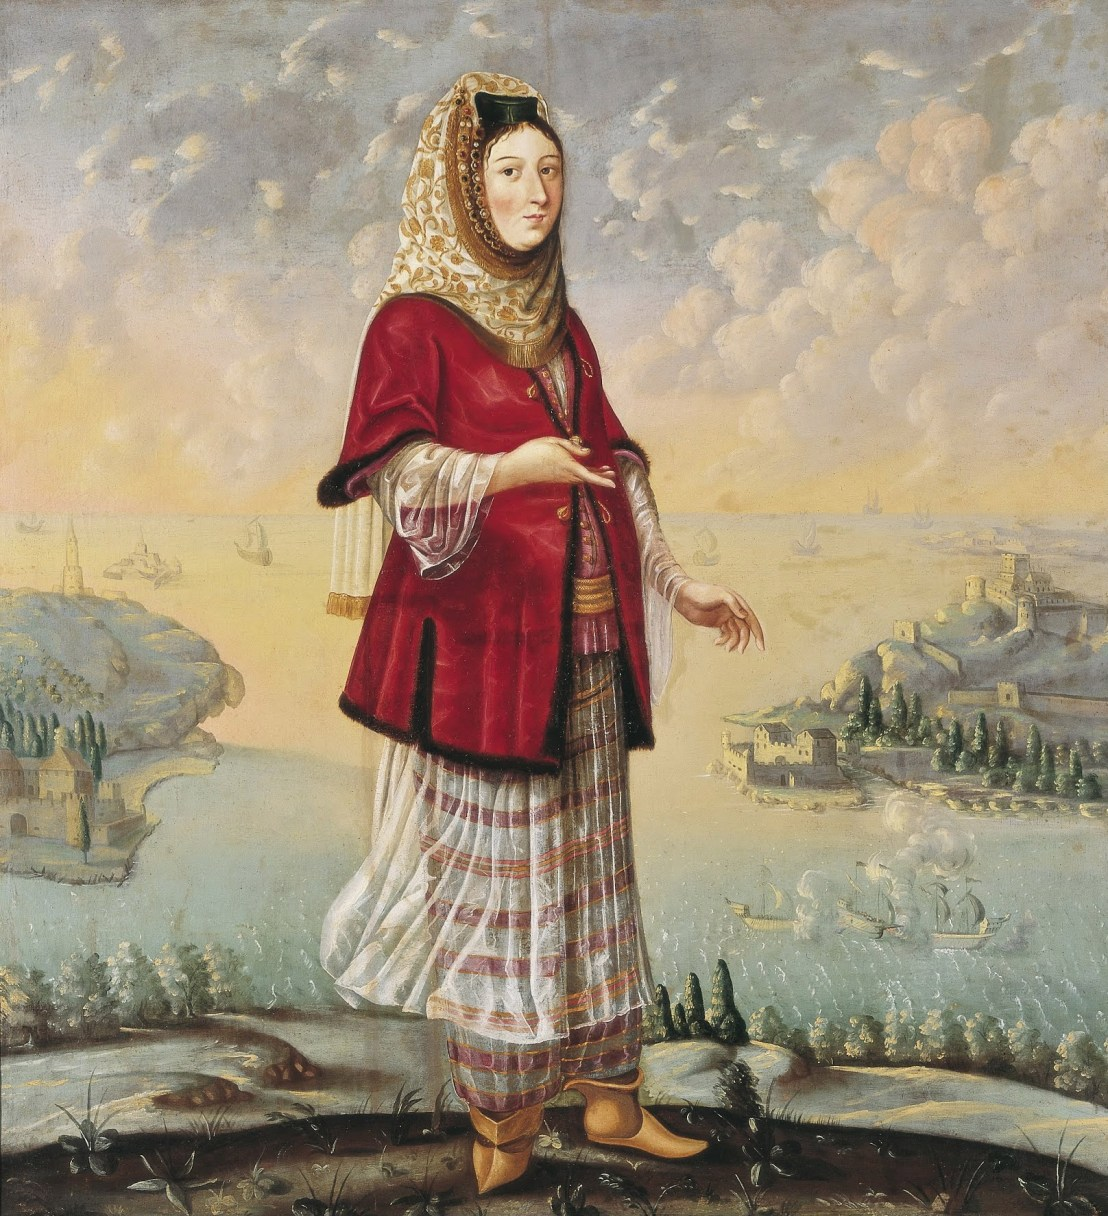 Armenian woman by Styrian painter Štajerski Slikar, 1682